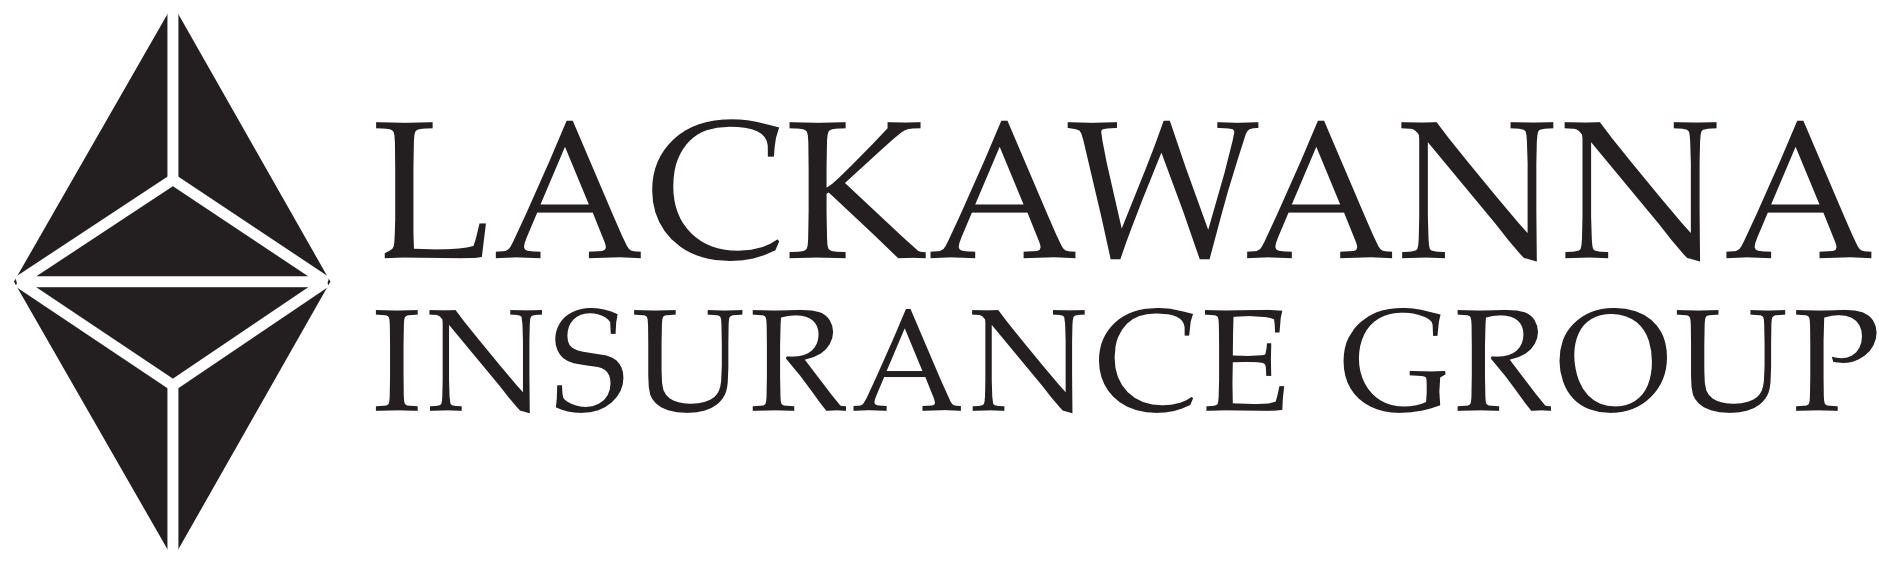 Lackawanna Insurance Group